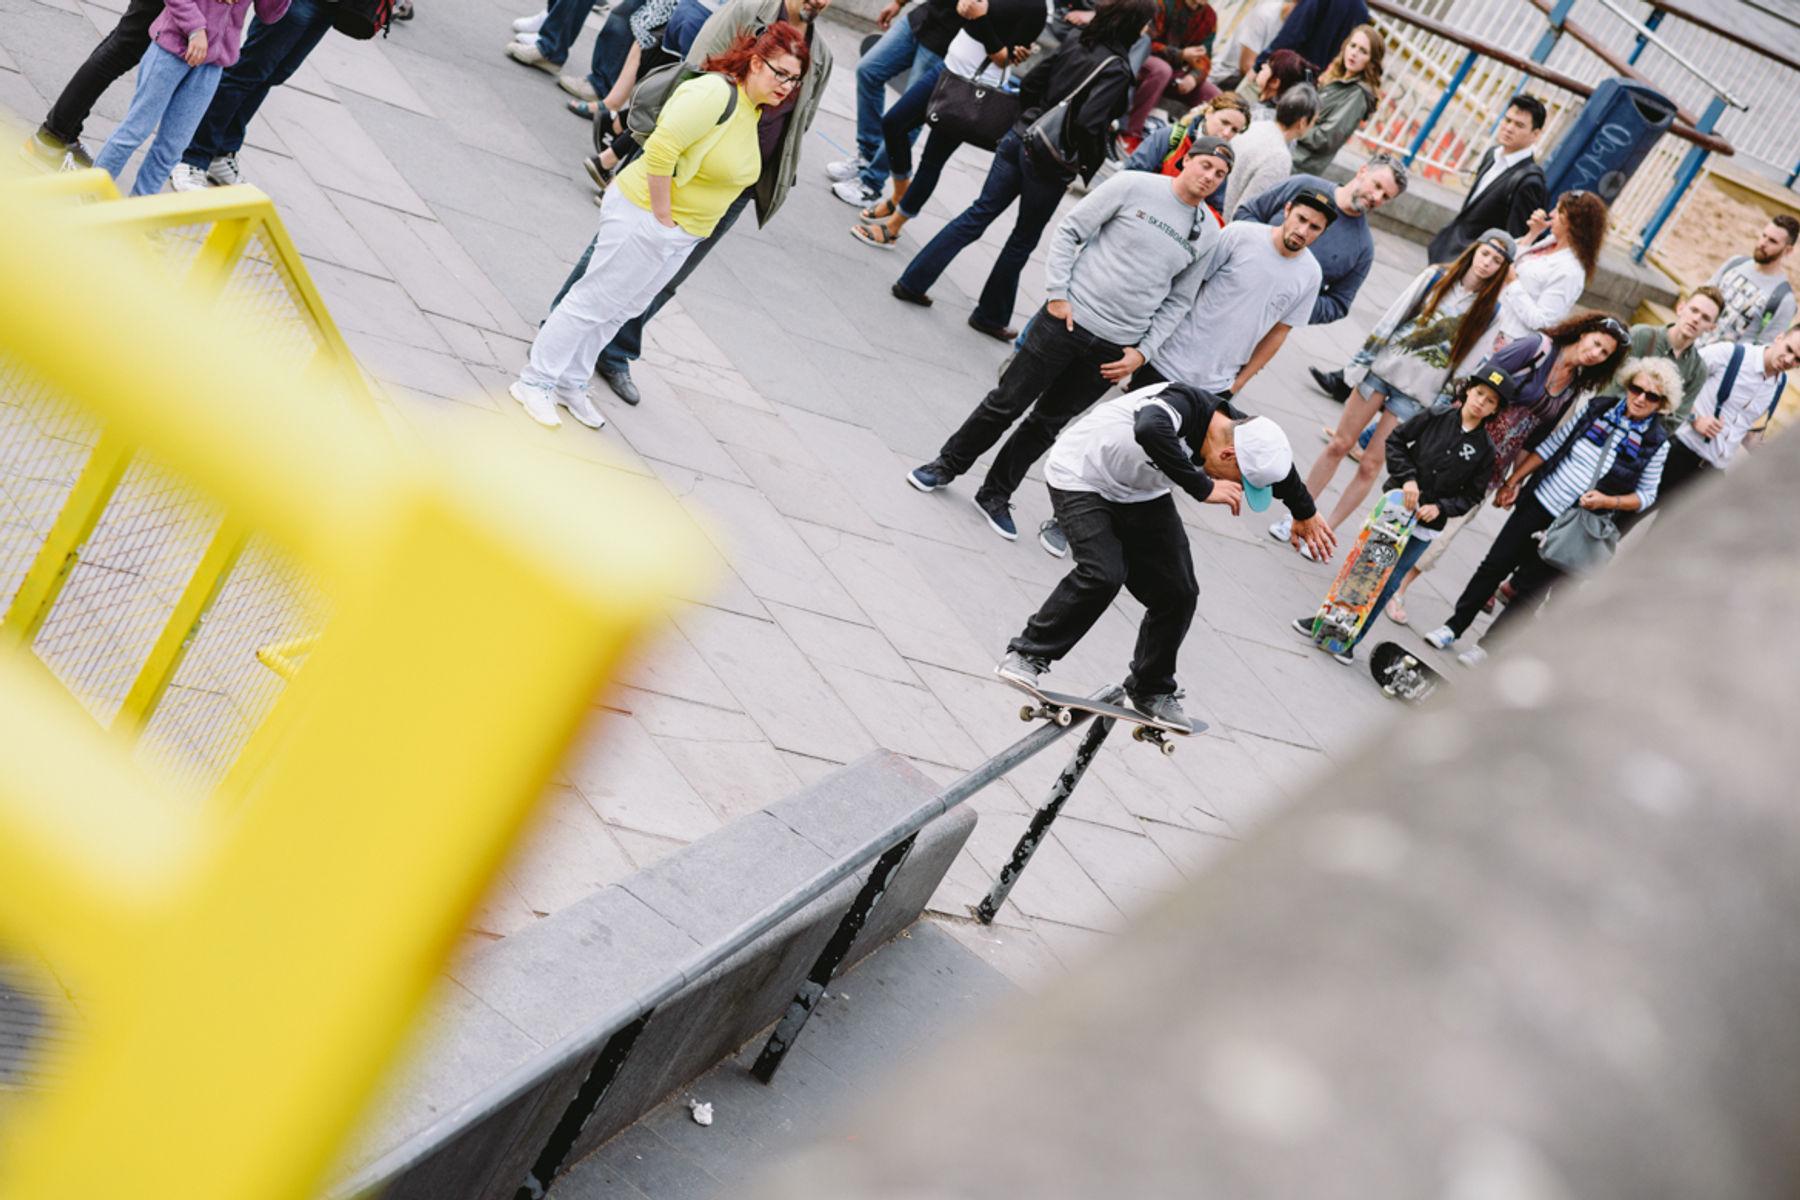 _IHC3210e-Antony-Lopez-Switch-Fs-Feeble-Dave-Snaddon-DC-Special-Delivery-Skate-Tour-BTS-Southbank-London-May-2015-Photographer-Maksim-Kalanep